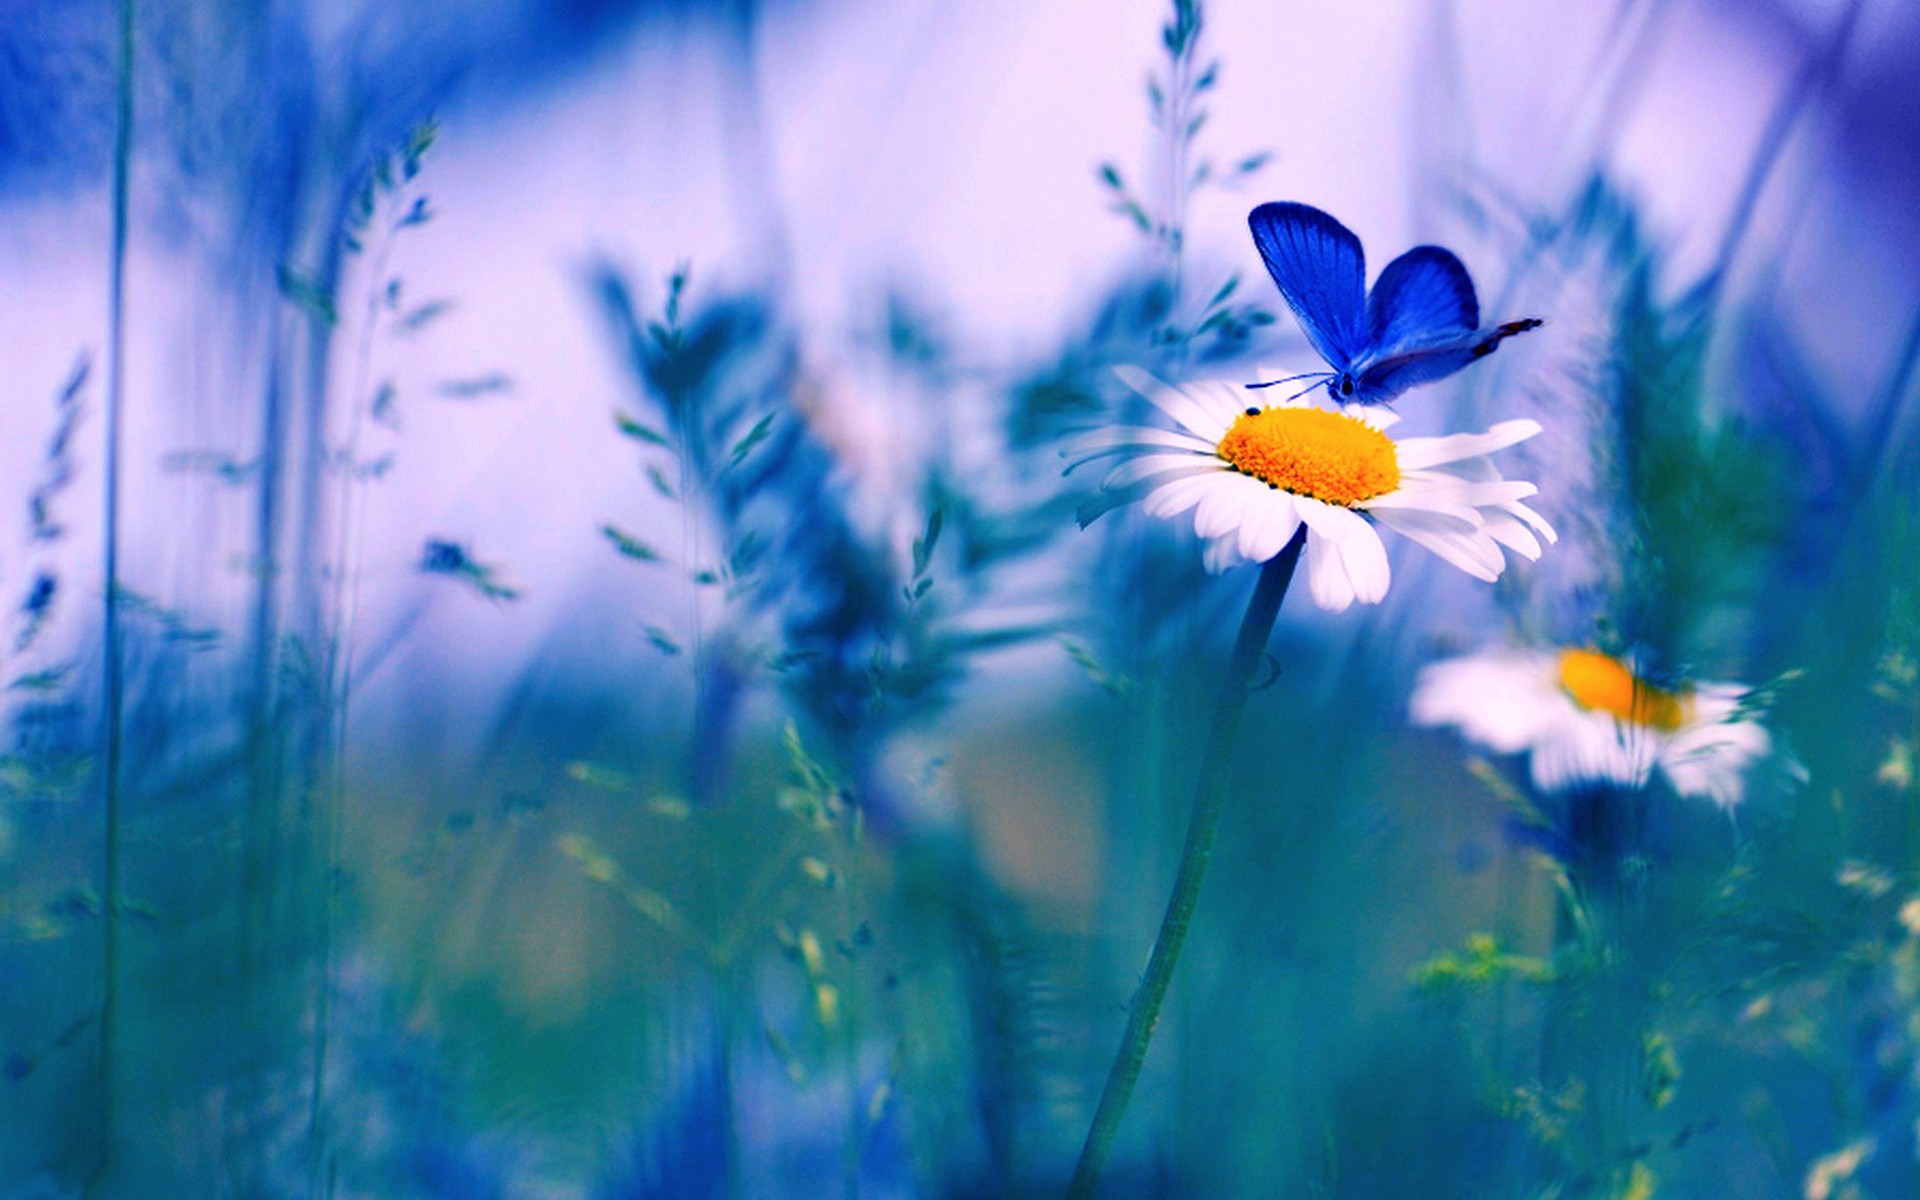 Hd wallpaper spring - Spring Butterfly Wallpaper Desktop 7779 Hd Wallpapers Site